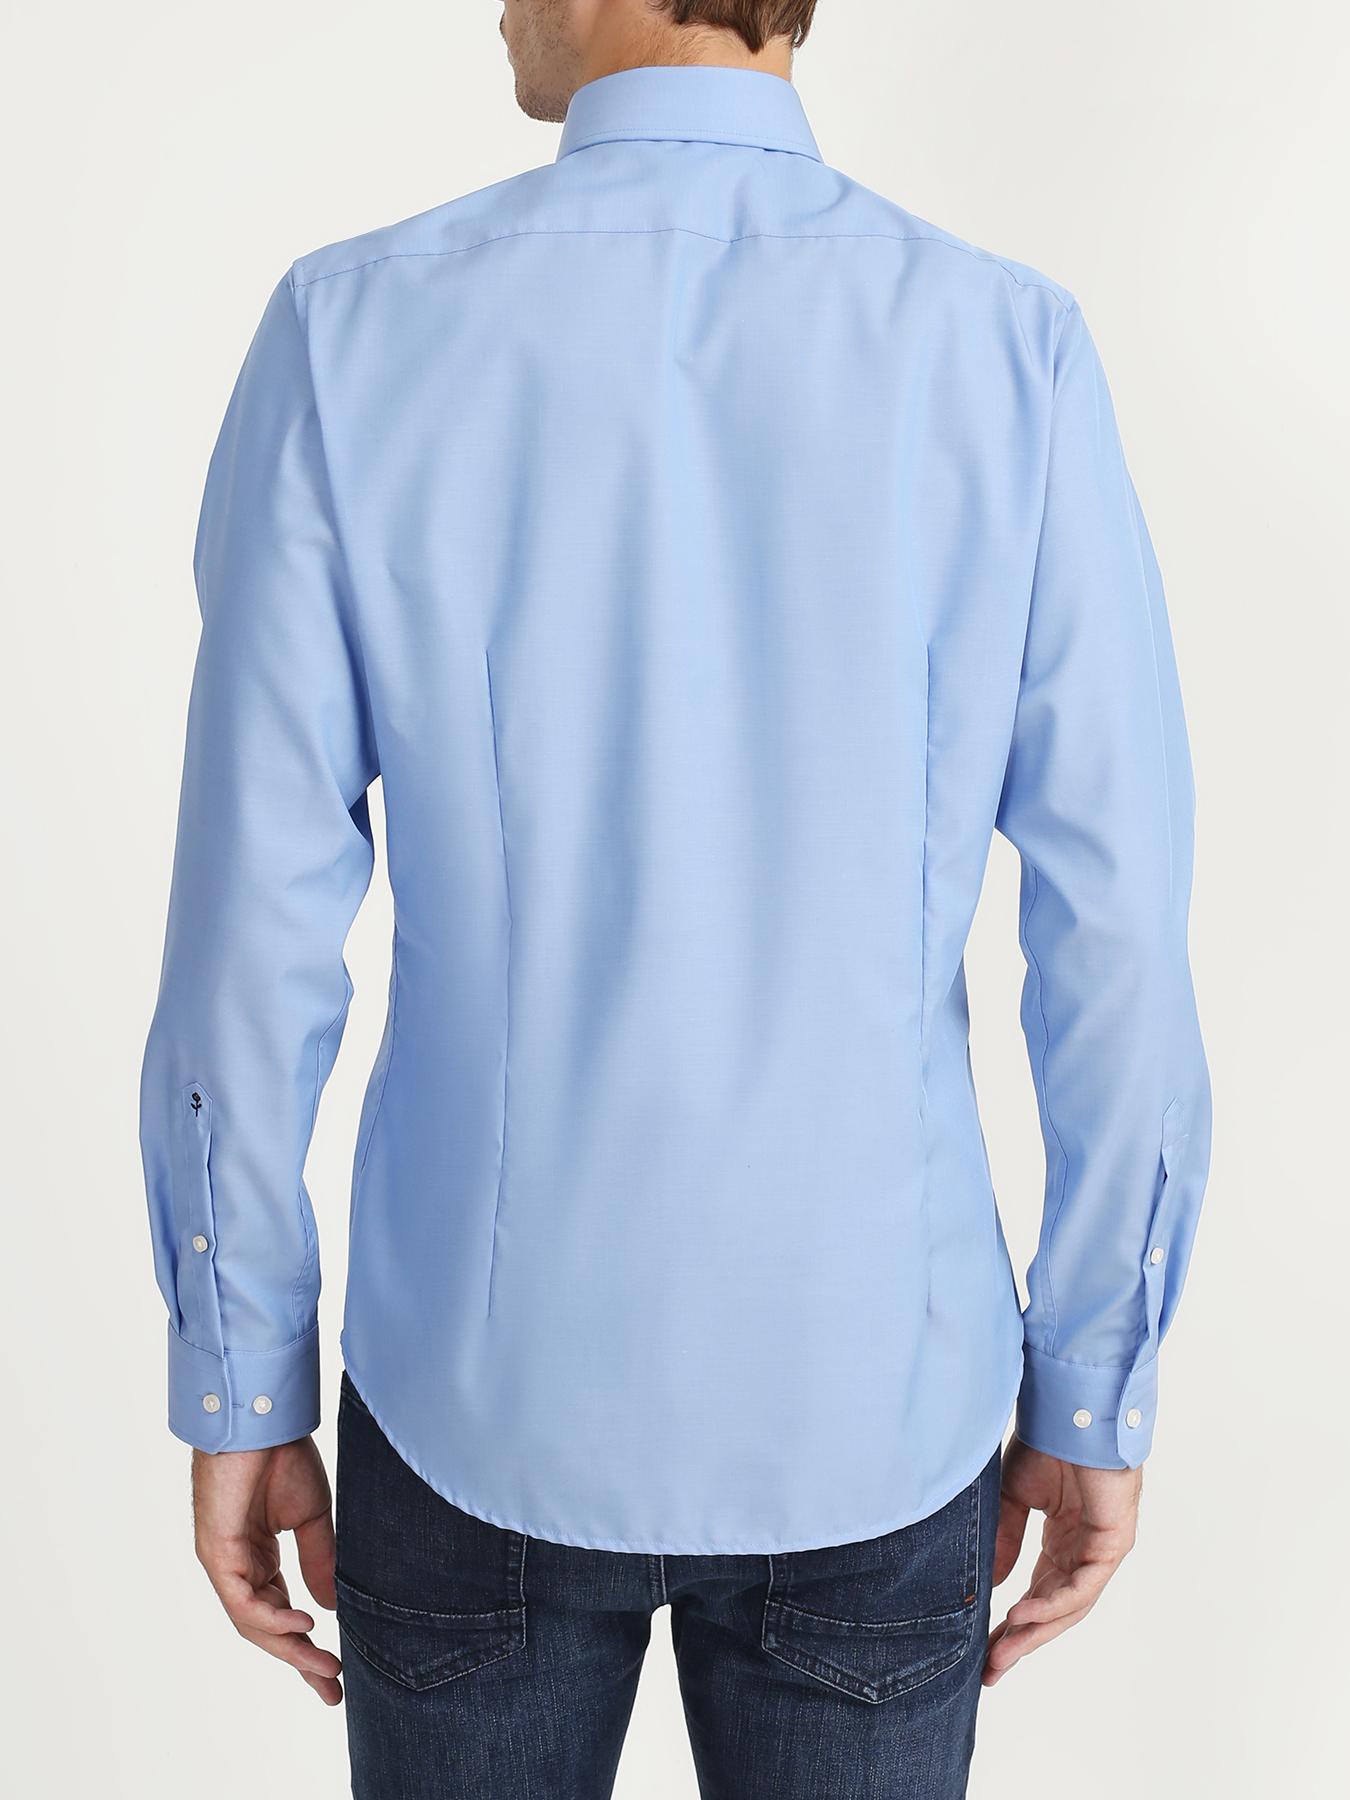 Seidensticker Хлопковая рубашка без карманов 322561-021 Фото 3